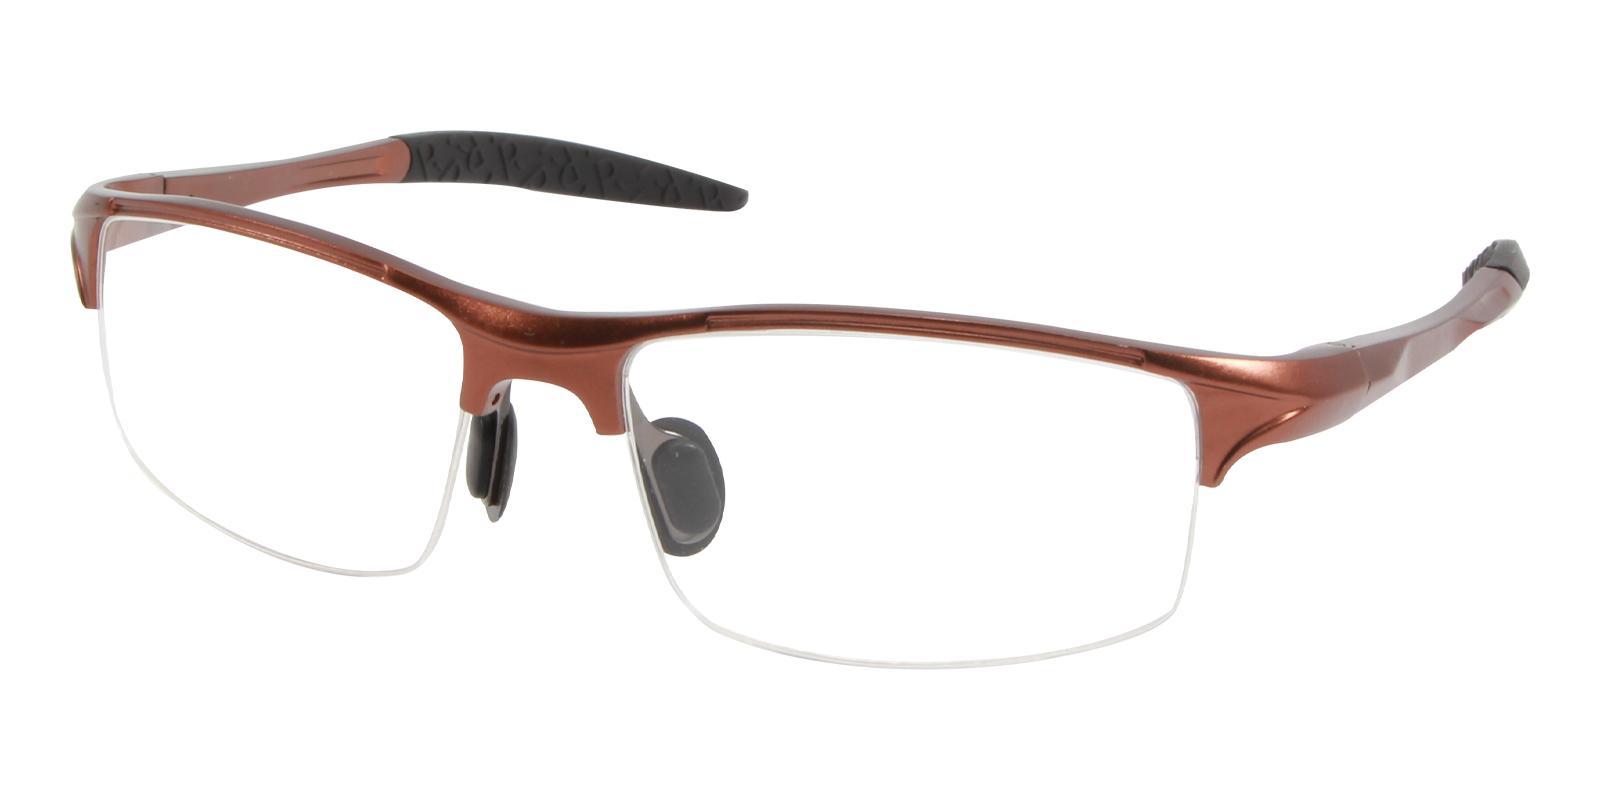 Alan Brown Metal NosePads , SportsGlasses , SpringHinges Frames from ABBE Glasses